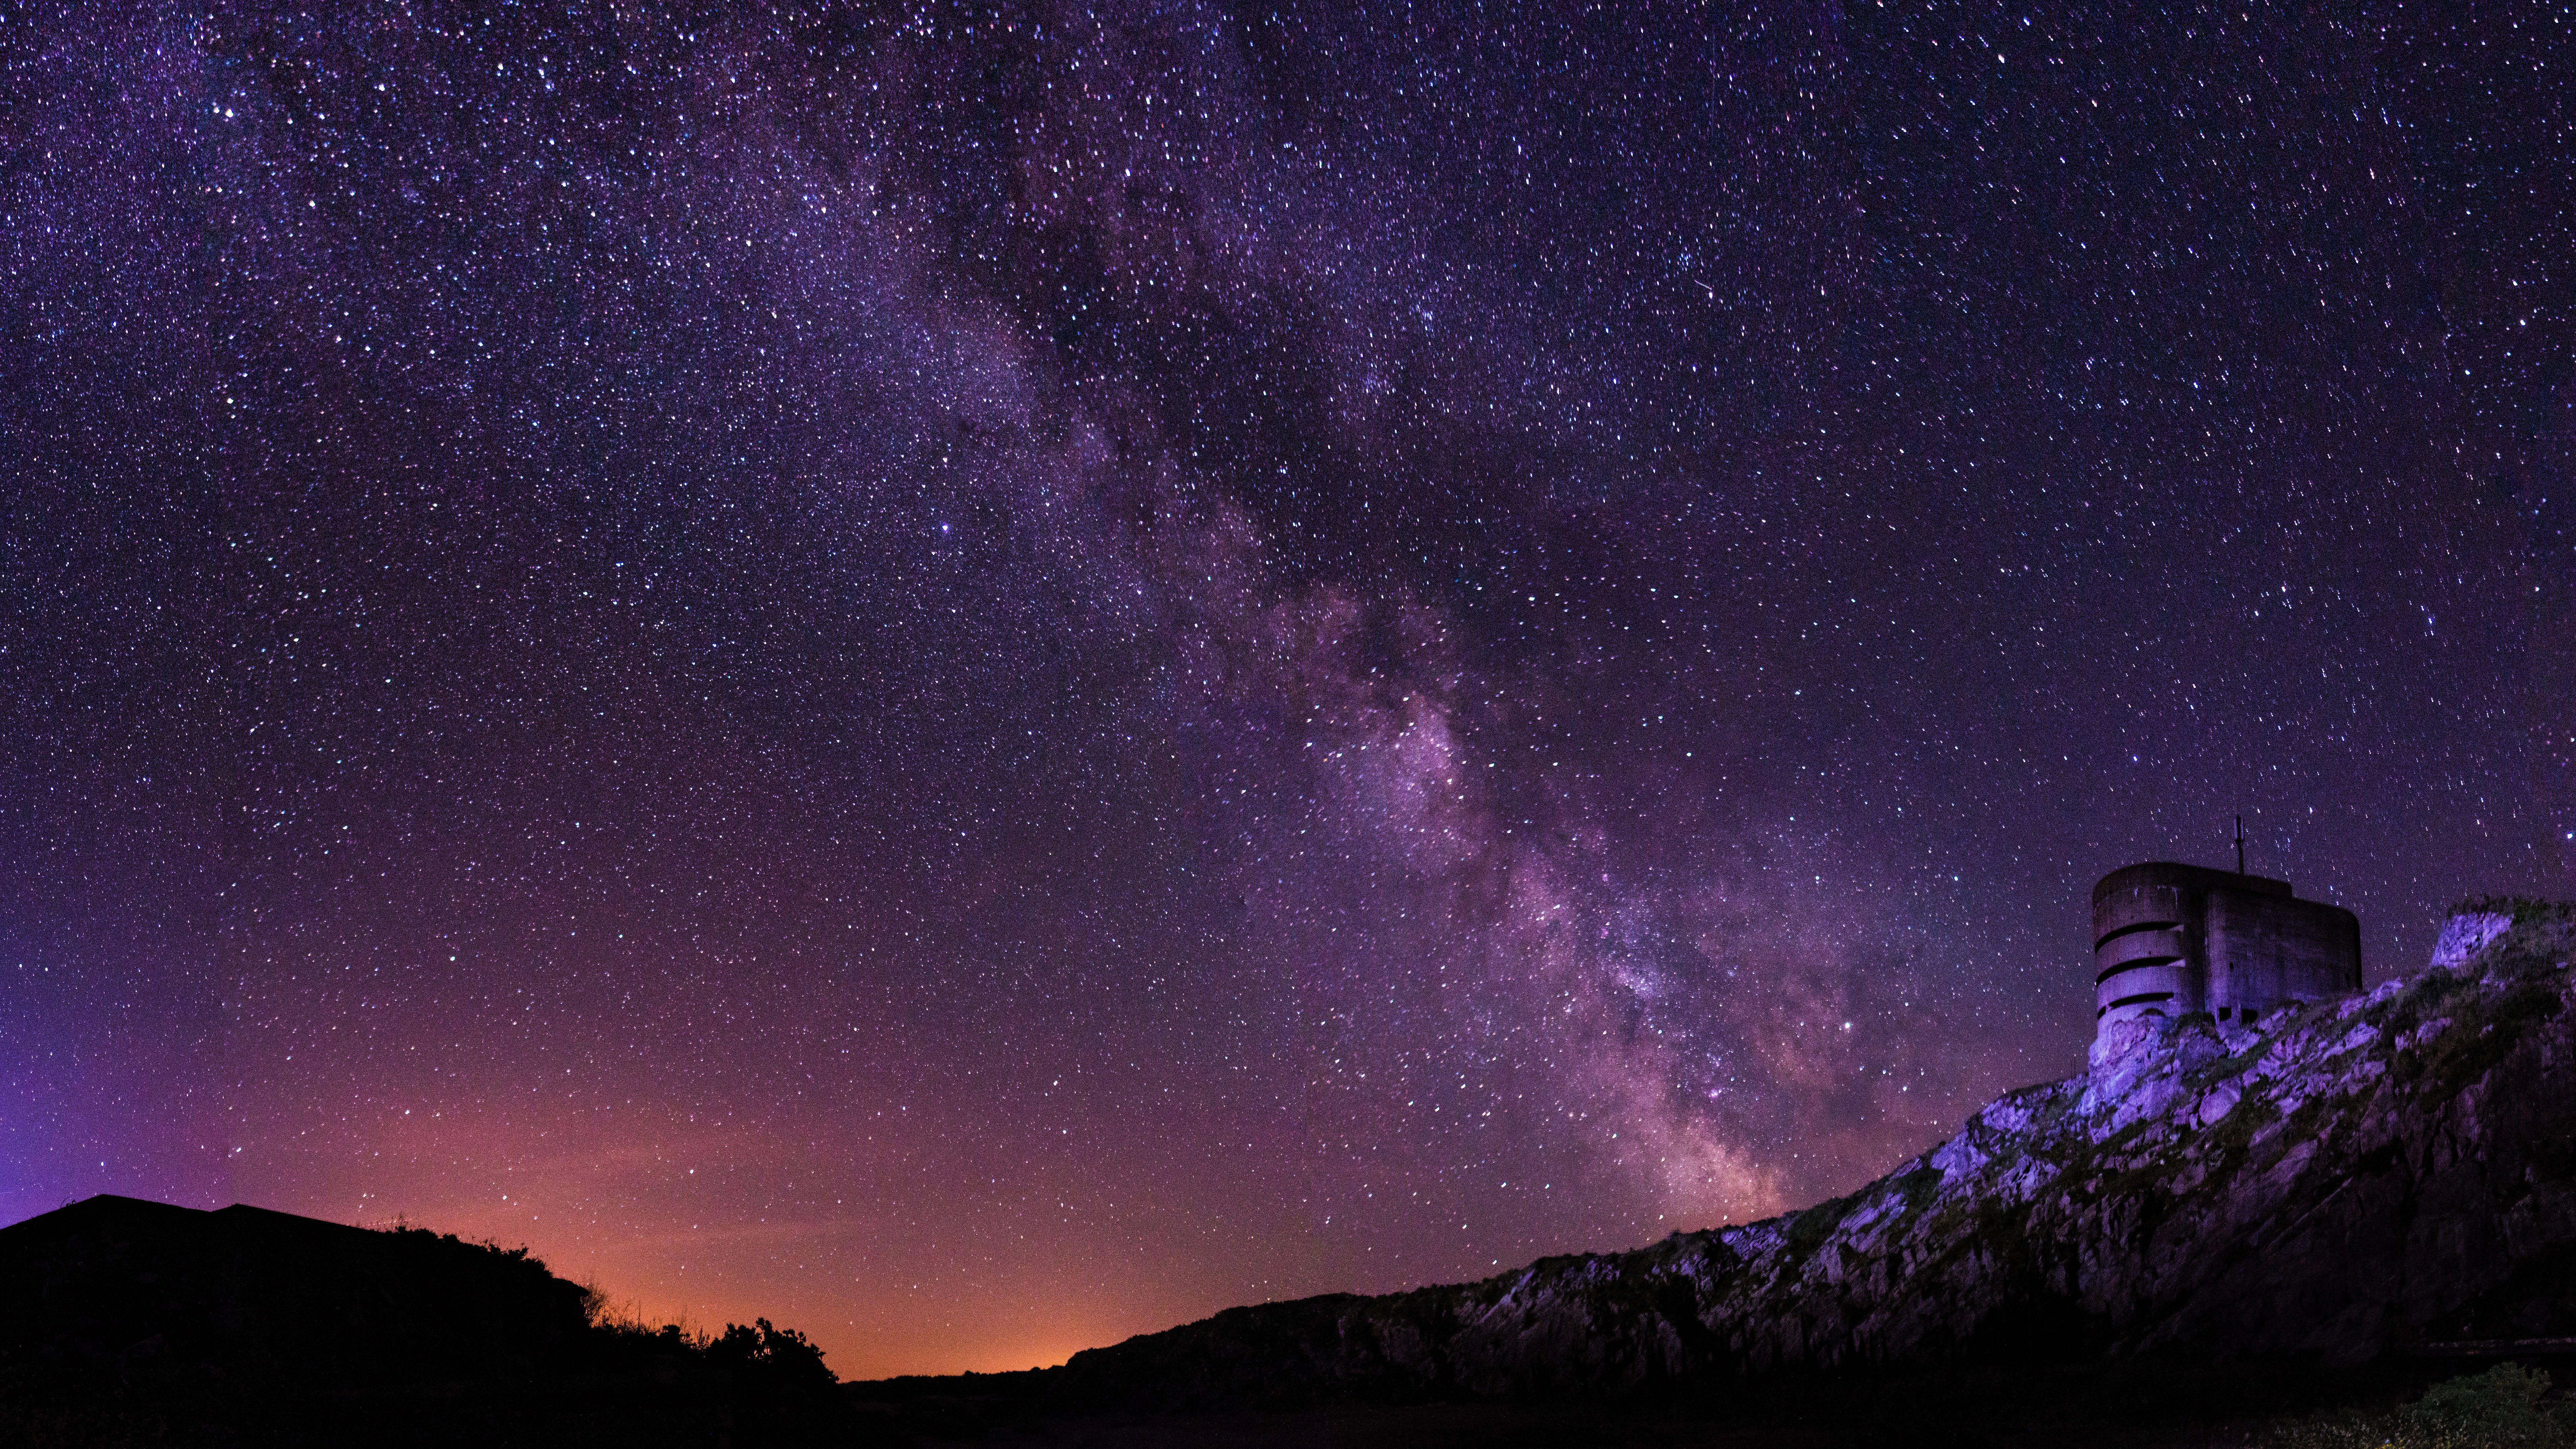 Starry Sky 4k 8k Night Sky Wallpaper Sky Wallpaper Starry Sky